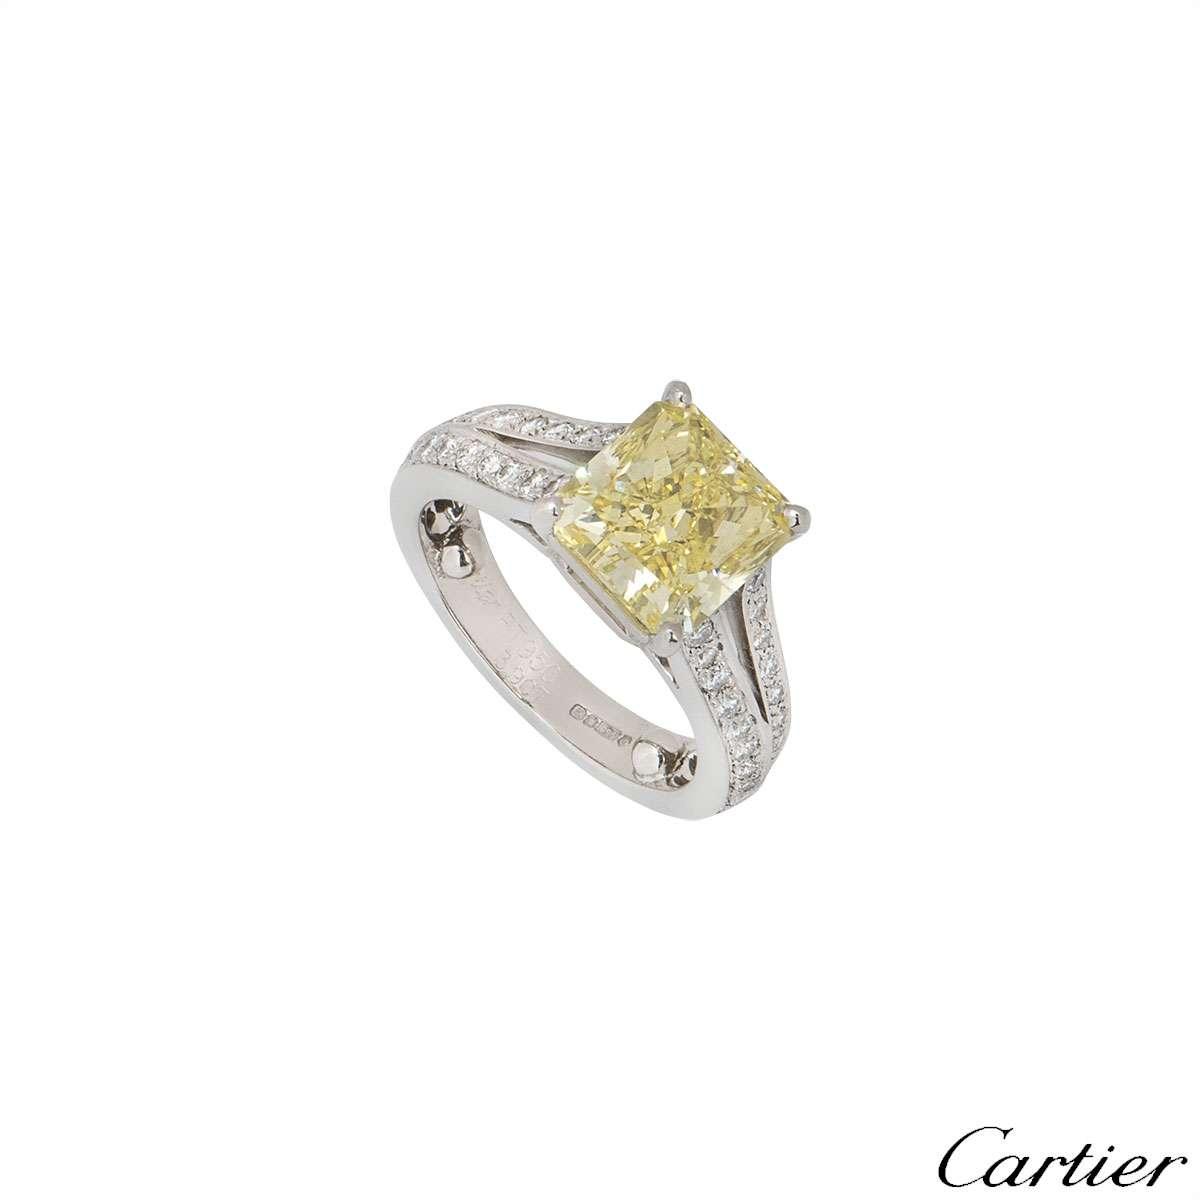 Cartier Platinum Fancy Intense Yellow Diamond Adele Ring 3.90ct VVS2